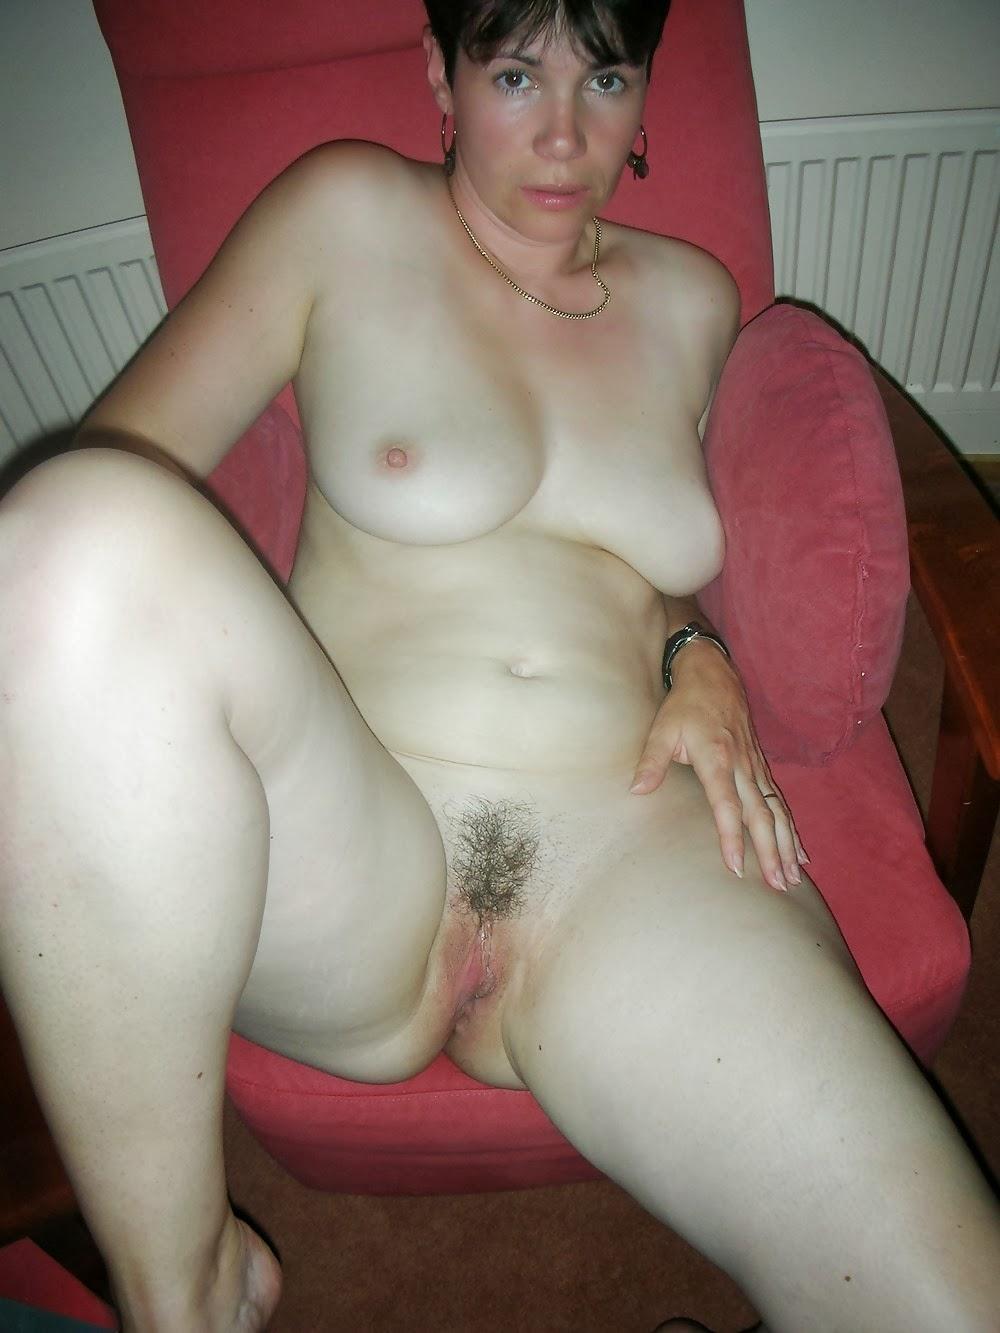 Real drunk girls having sex